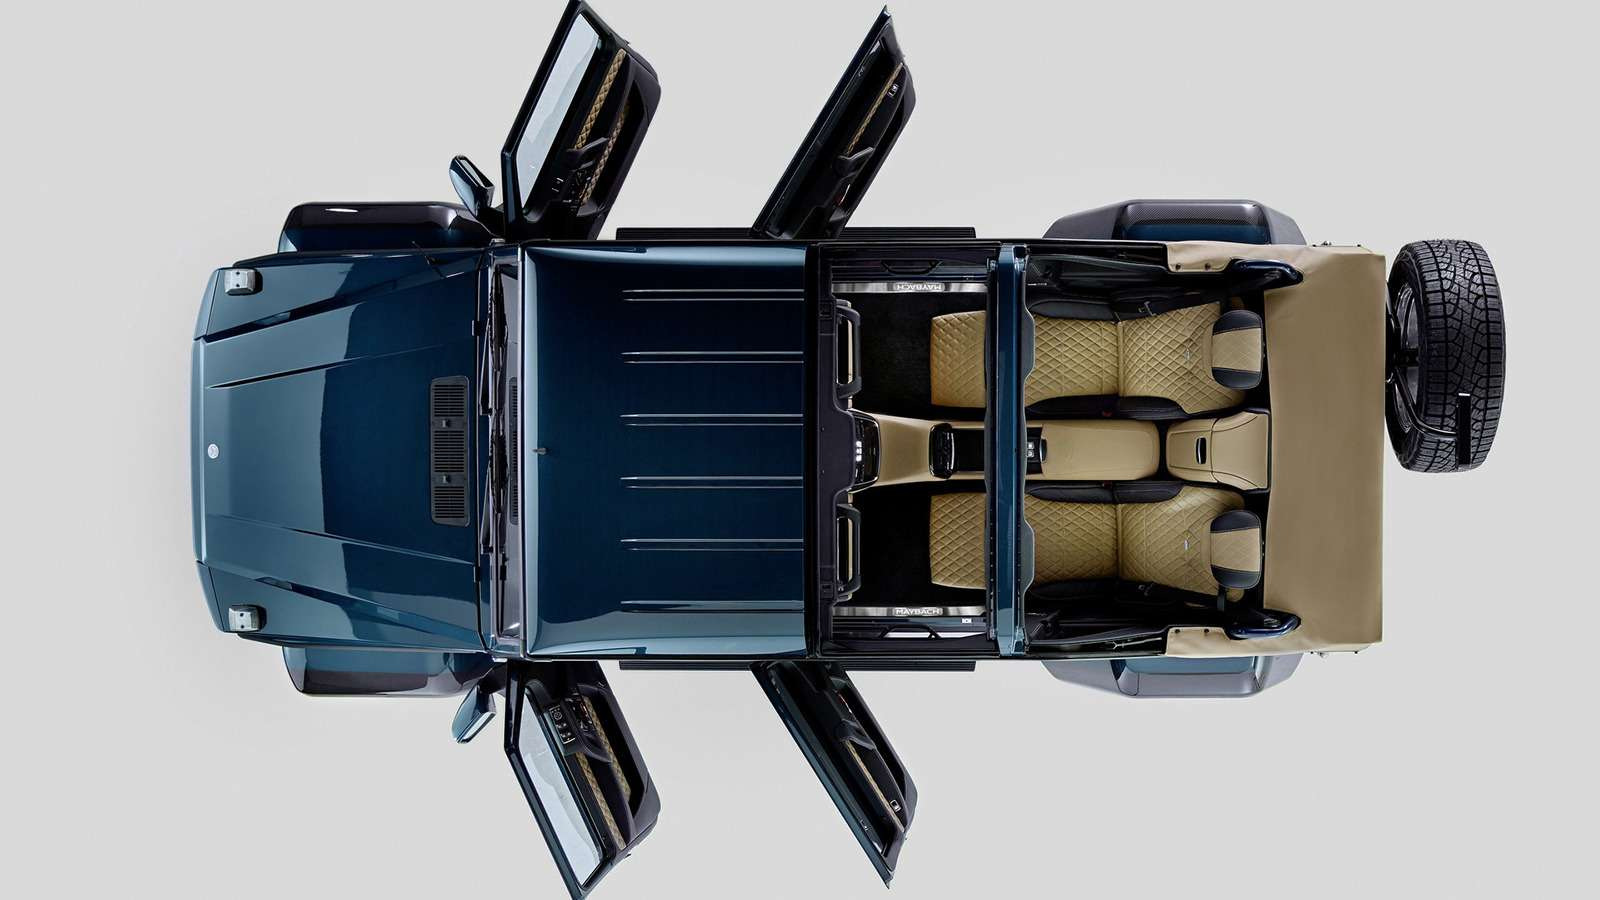 Внедорожник Maybach продали за1,2 миллиона евро. Икупил его нешейх!— фото 803352